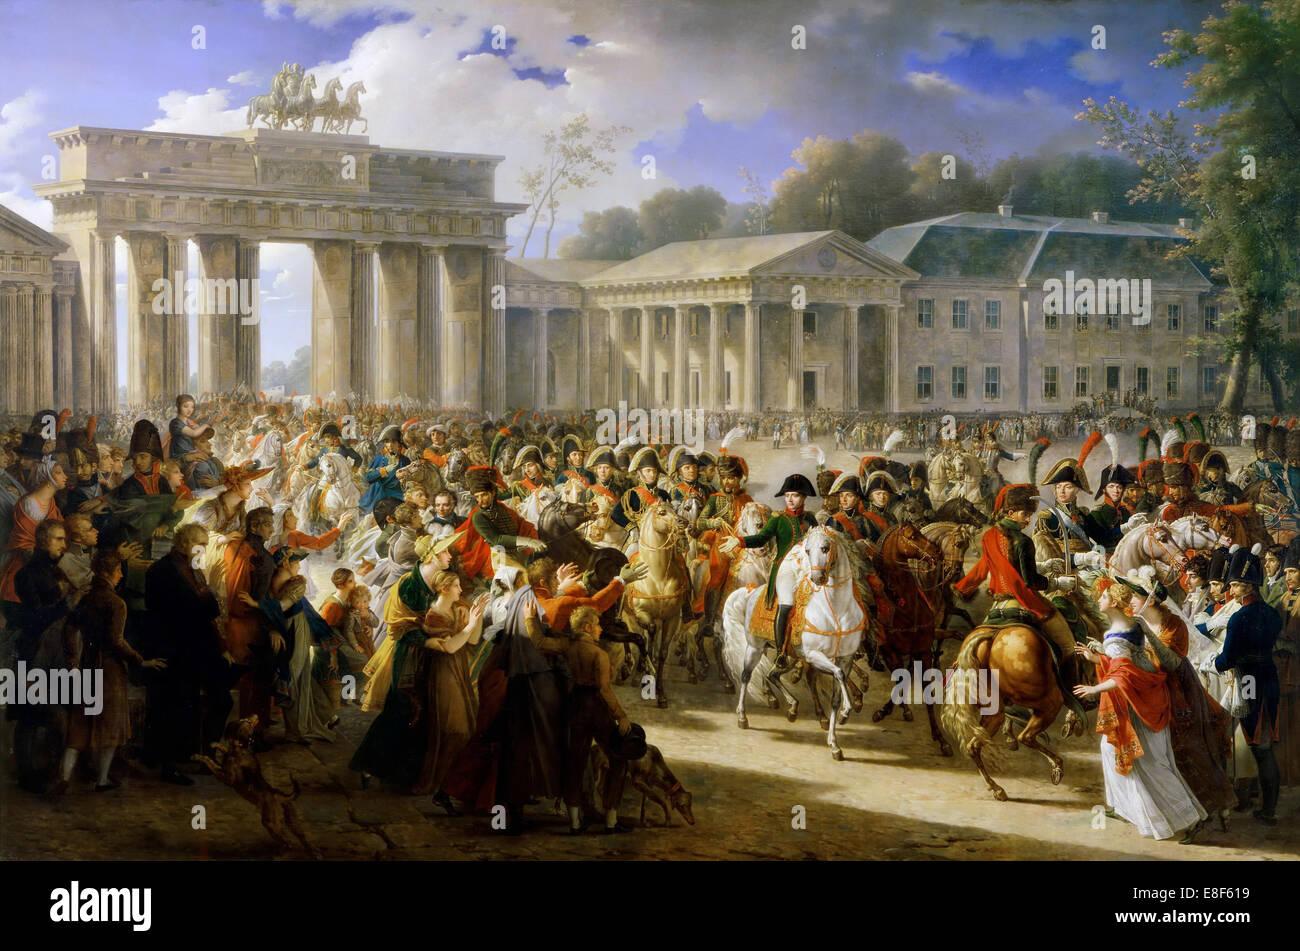 Entry of Napoleon into Berlin, 27 October 1806. Artist: Meynier, Charles (1768-1832) - Stock Image